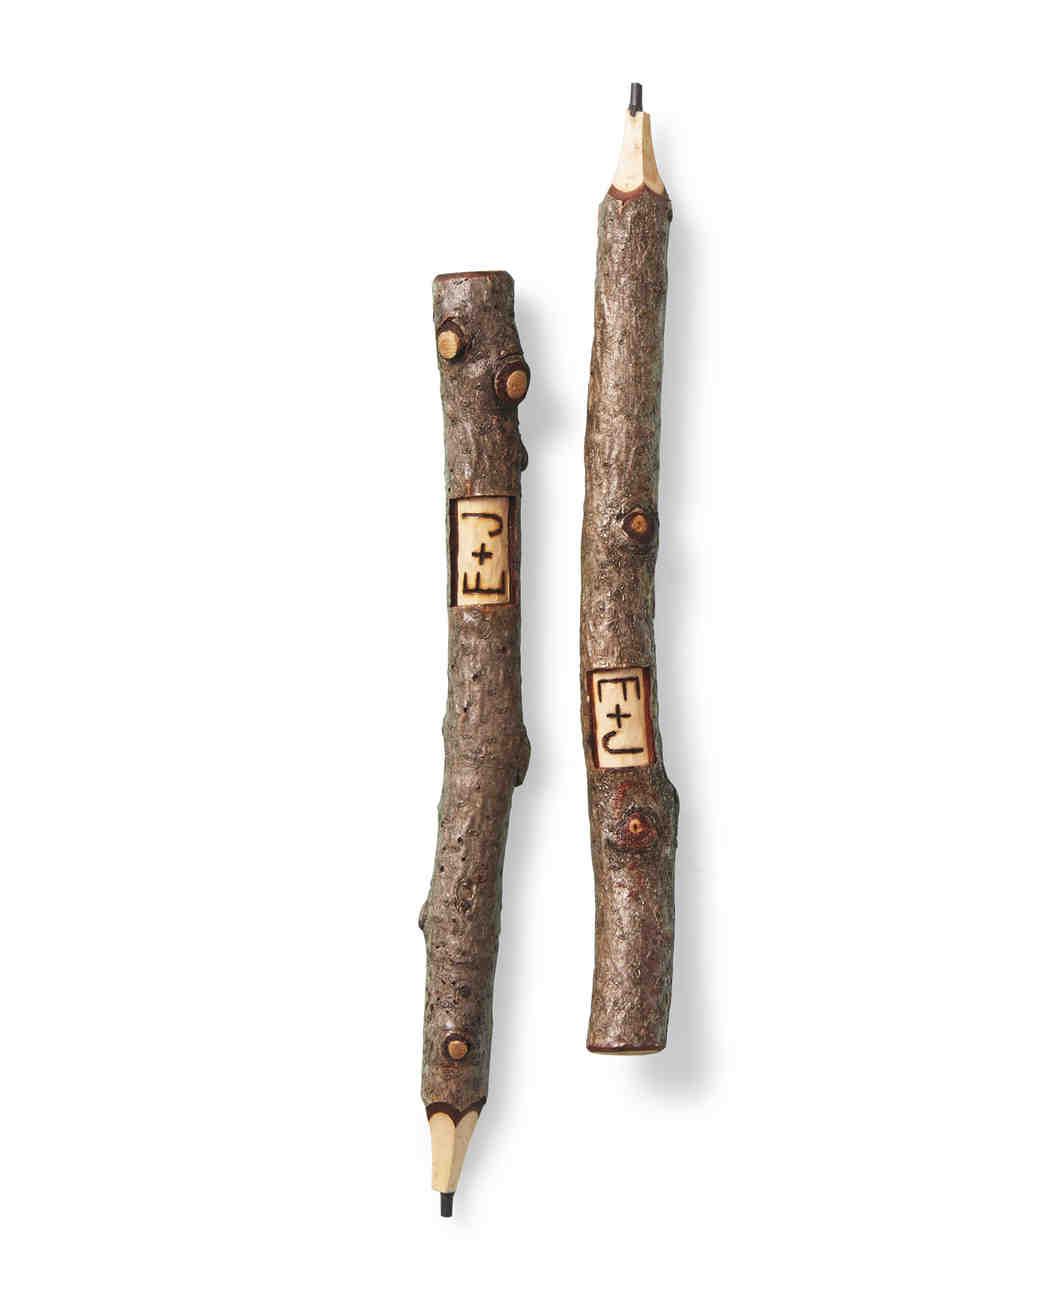 utah-ut-pencils-154-d111965.jpg